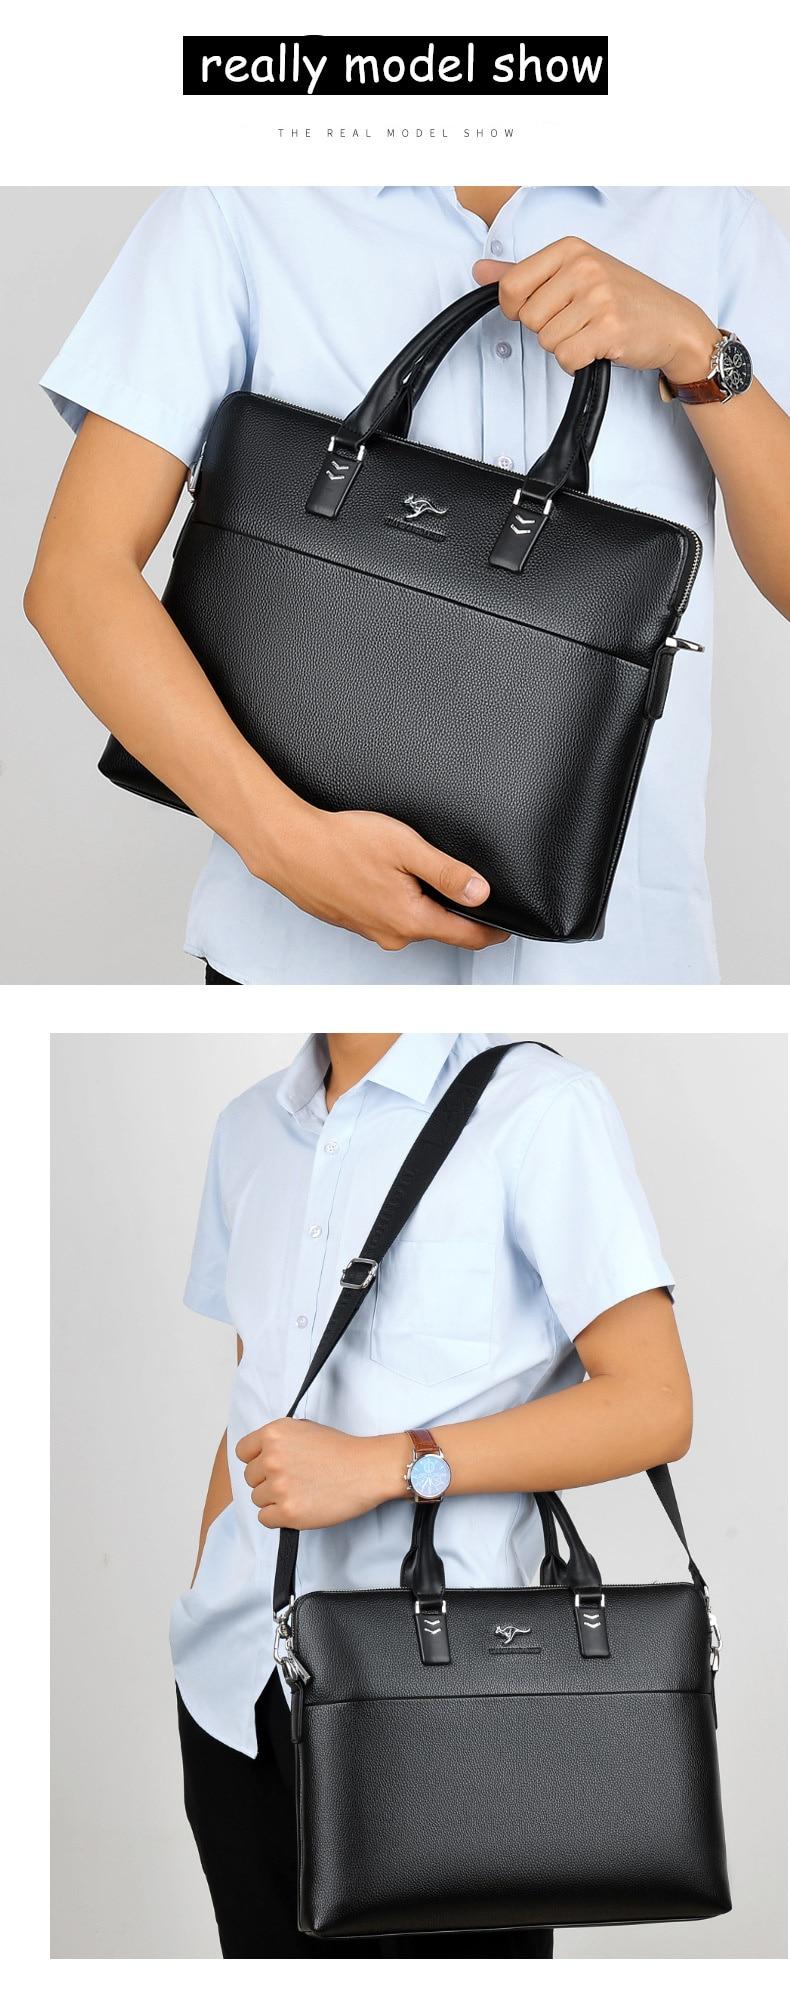 HTB1pk2Wdgb.PuJjSZFpq6zuFpXaZ TIANHONGDAISHU Men Casual Briefcase Business Shoulder Leather Messenger Bags Computer Laptop Handbag Men's Travel Bags handbags